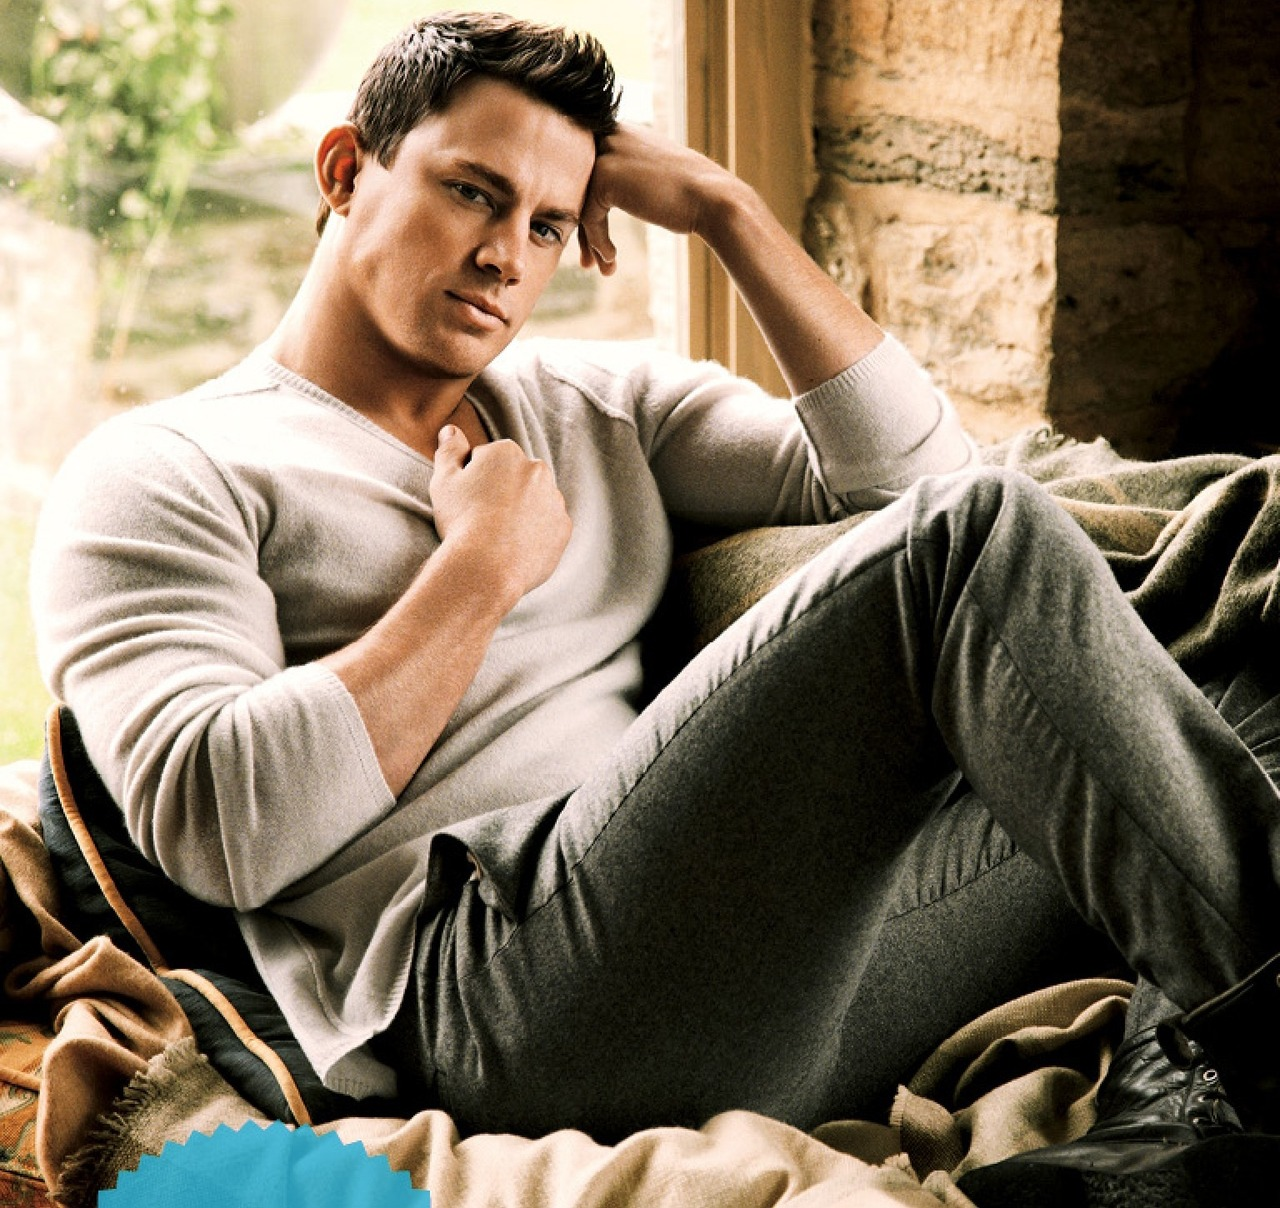 http://3.bp.blogspot.com/-ttKNxlTpeYM/UKkpDEUJOeI/AAAAAAAAIlY/6-TXQuMlfc8/s1600/%5BGSG%5D+Channing-Tatum-named-2012-sexiest-man-alive-by-People-01+%286%29.jpg